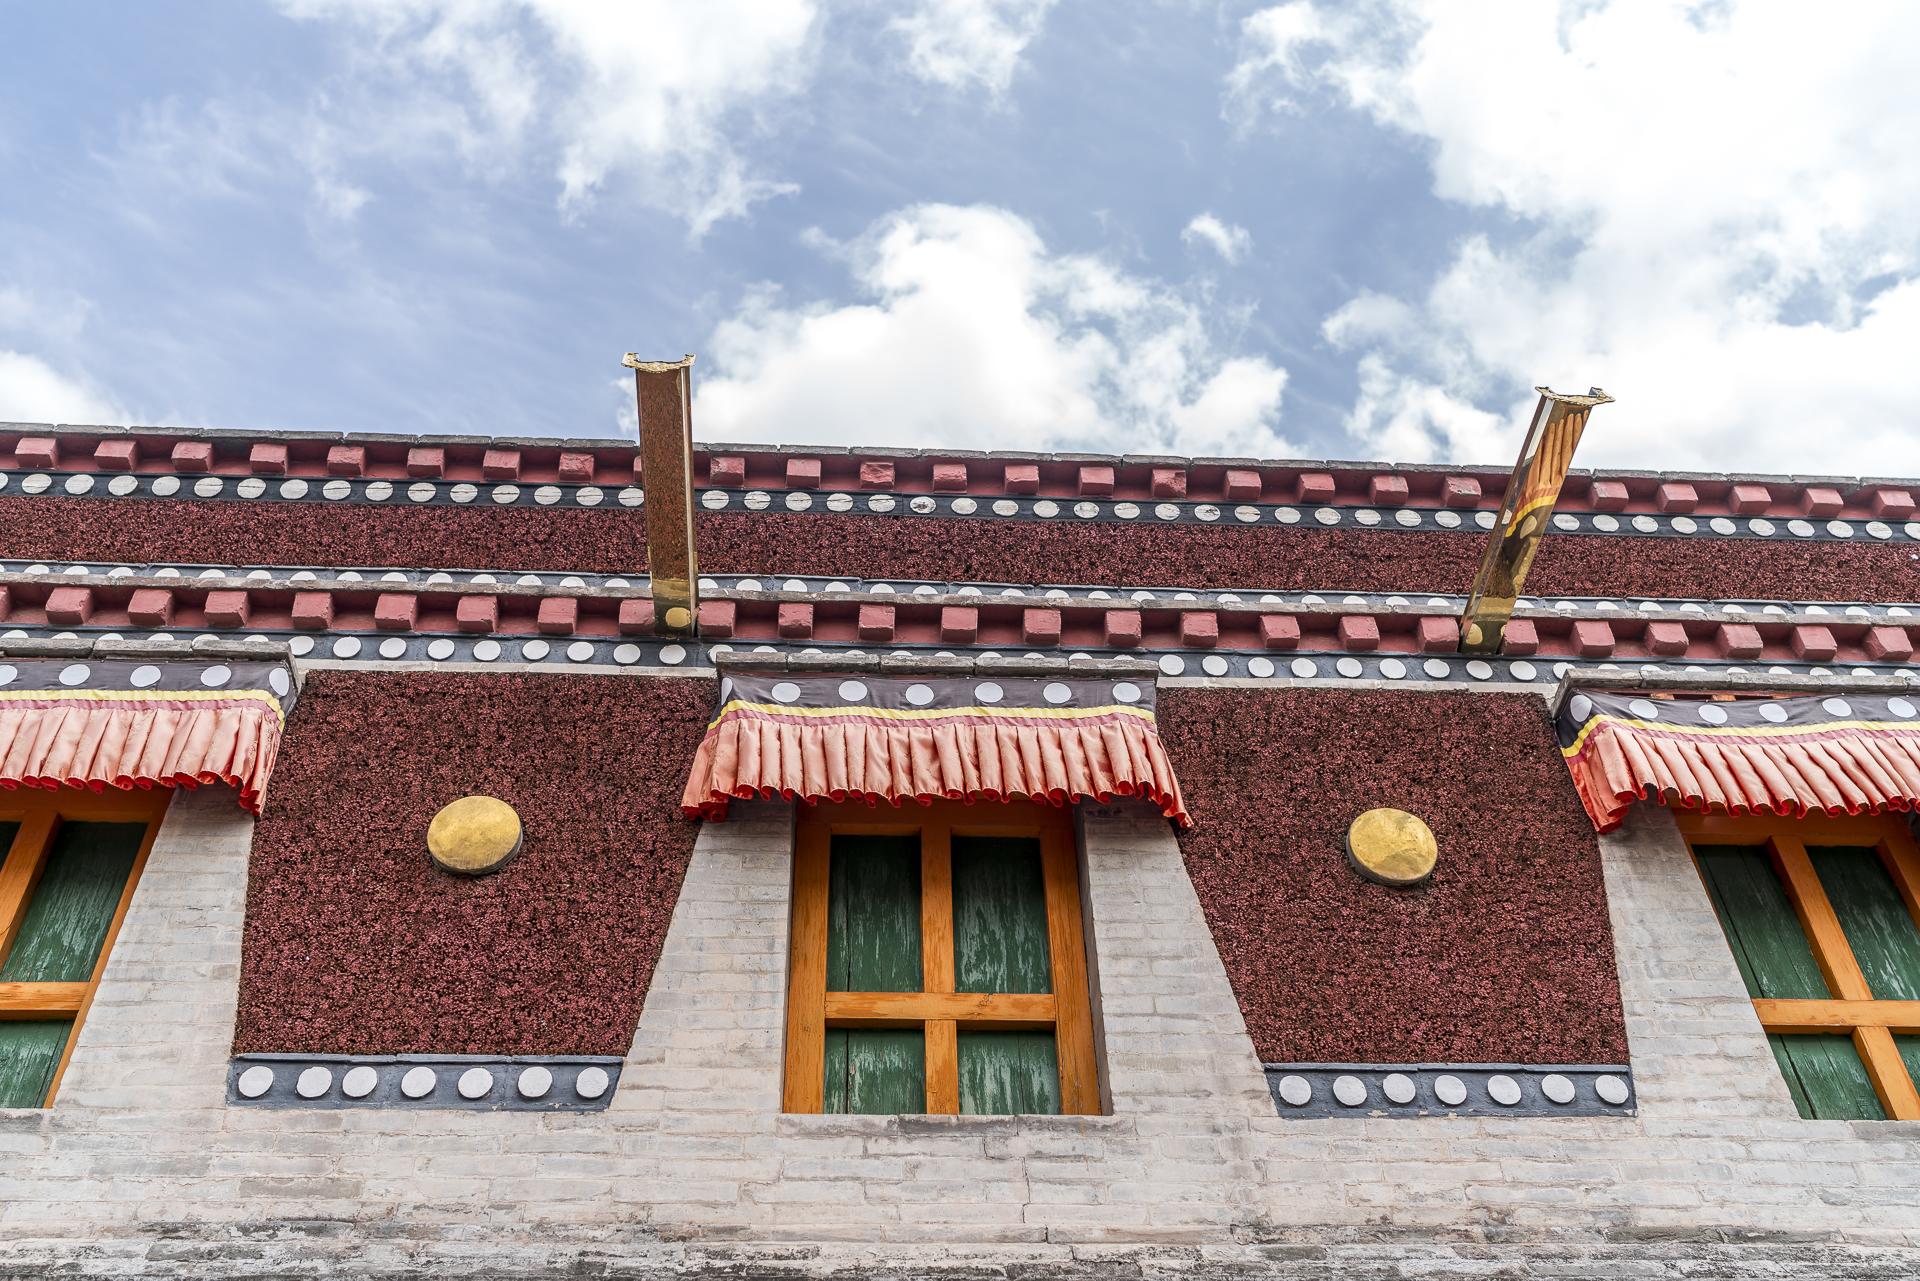 Tibetisches Kloster in Xining